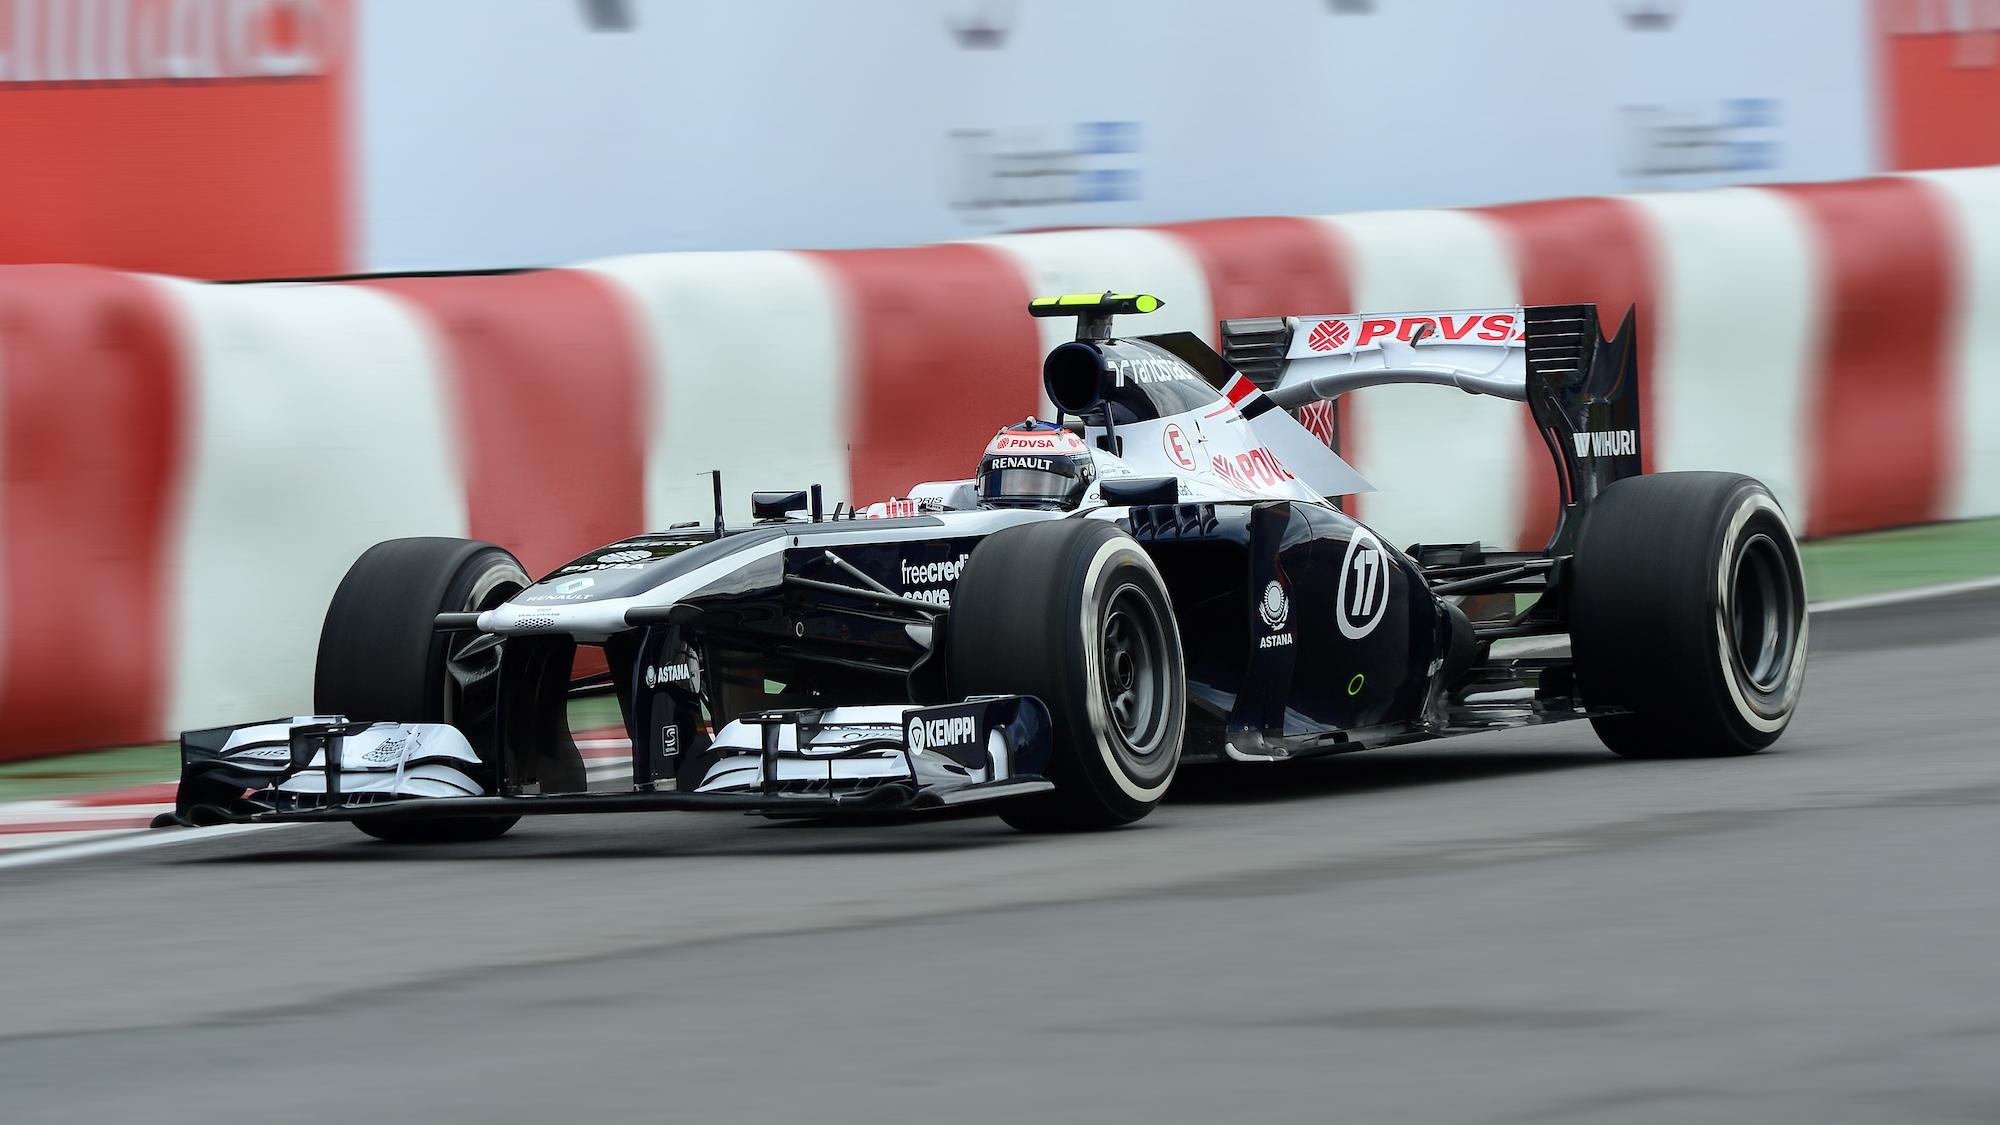 Valtteri Bottas, 2013 Canadian GP